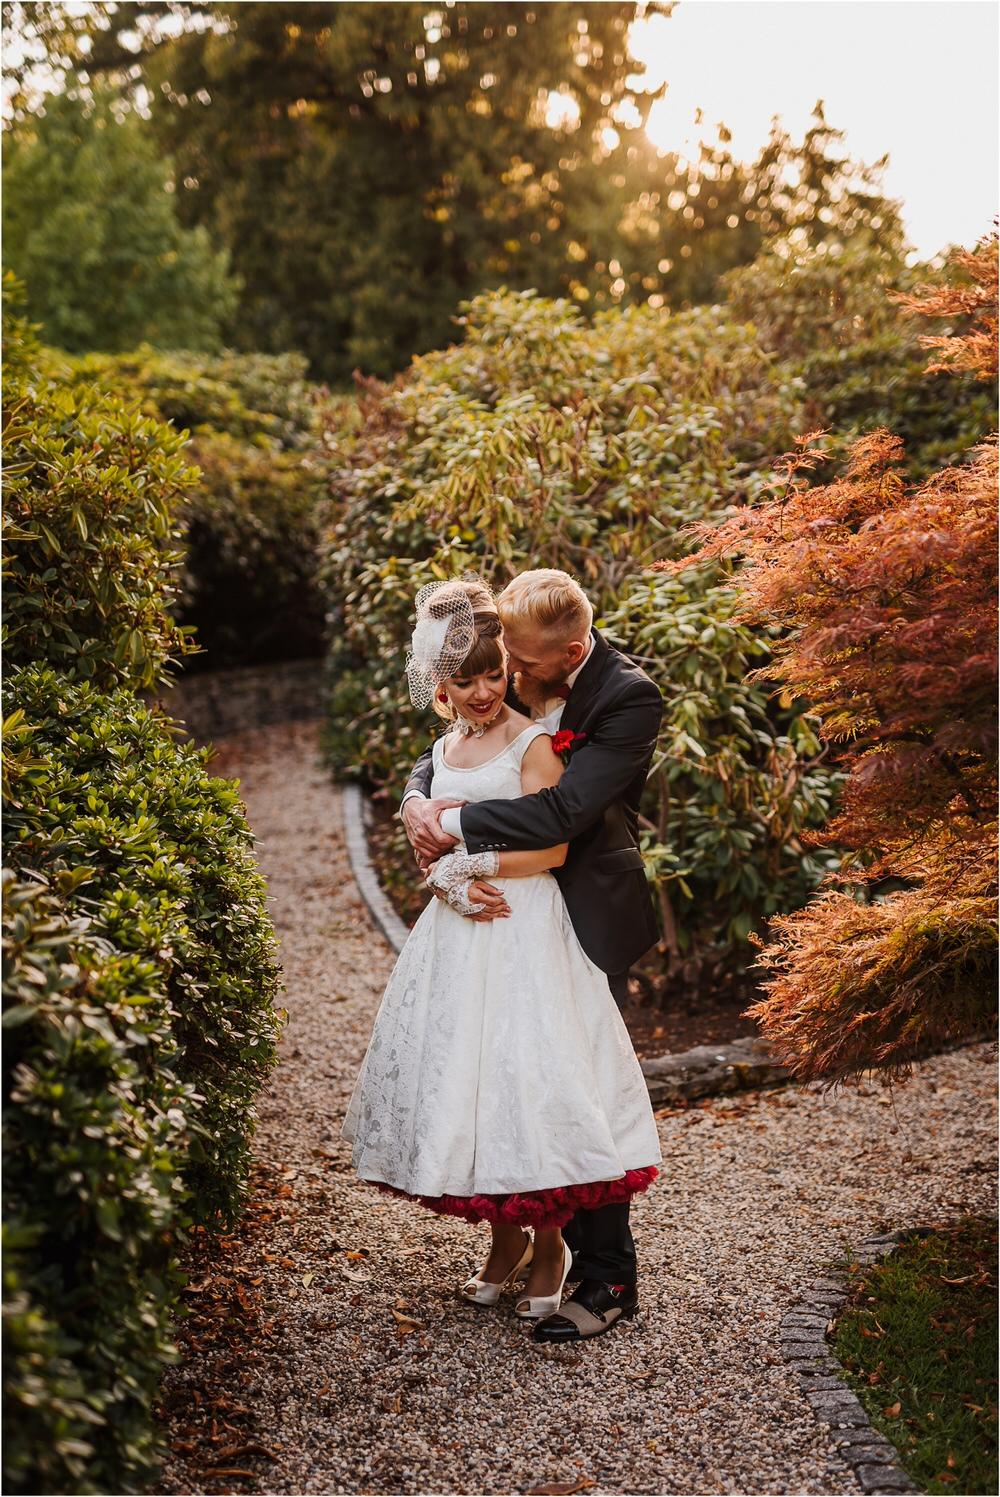 evian france wedding photographer photographer hotel royale rockabilly wedding poroka tematska nika grega themed wedding 0069.jpg